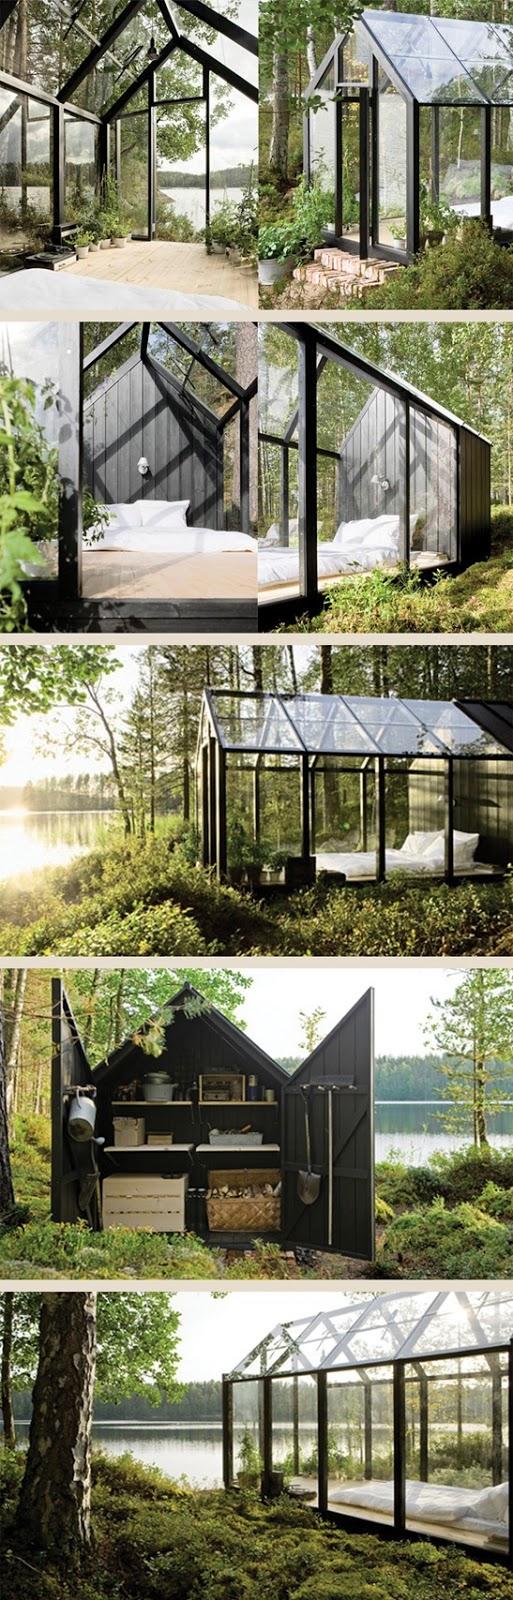 La botte secr te organiser son garage atelier ou sa cabane de jardin - Cabane jardin atelier besancon ...